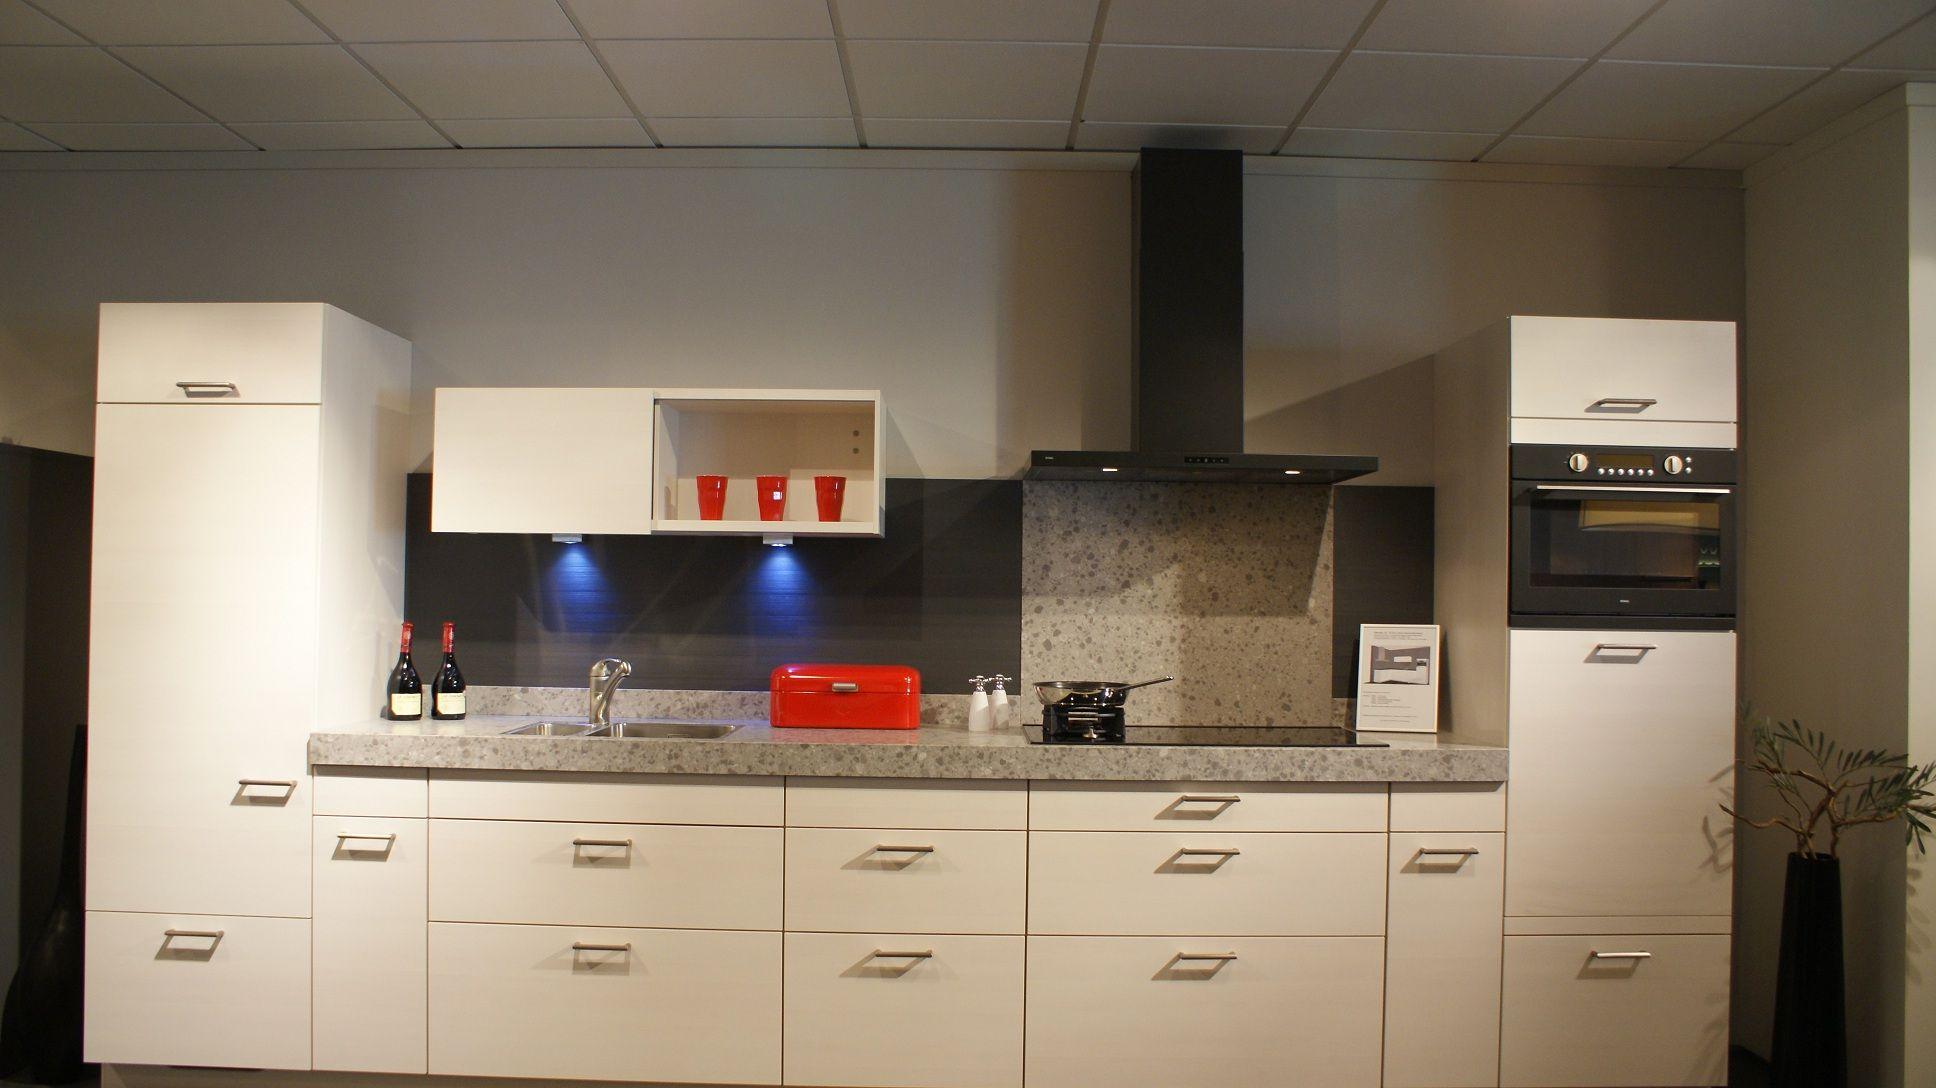 Siematic showroomkeukens siematic showroomkeuken aanbiedingen siematic sc10 48687 - Model keuken ...